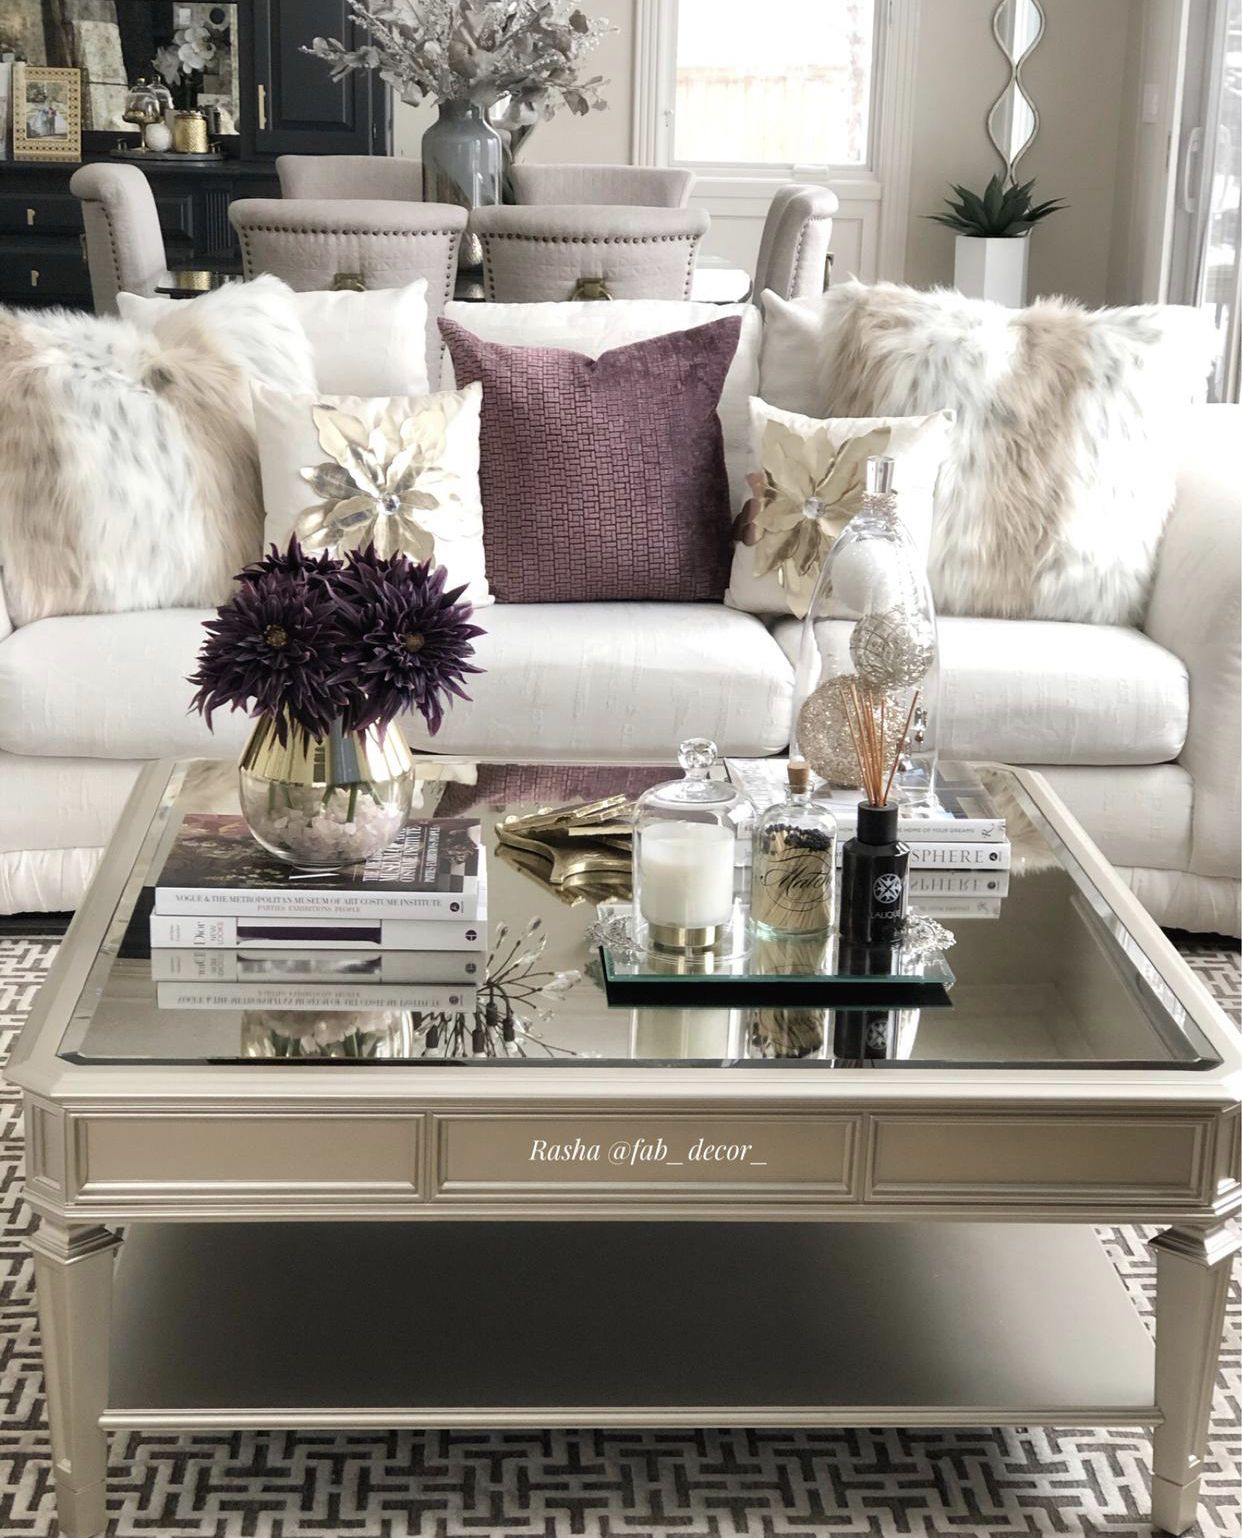 Shop my living room space  #homedecor #livingroom #livingroomdecor #homedesign #coffeetable #luxurioushomes #newhome #homesweethome #luxuryhomedesign #staging #decoronabudget #diningroom #diningroomdecor #designonadime #interior